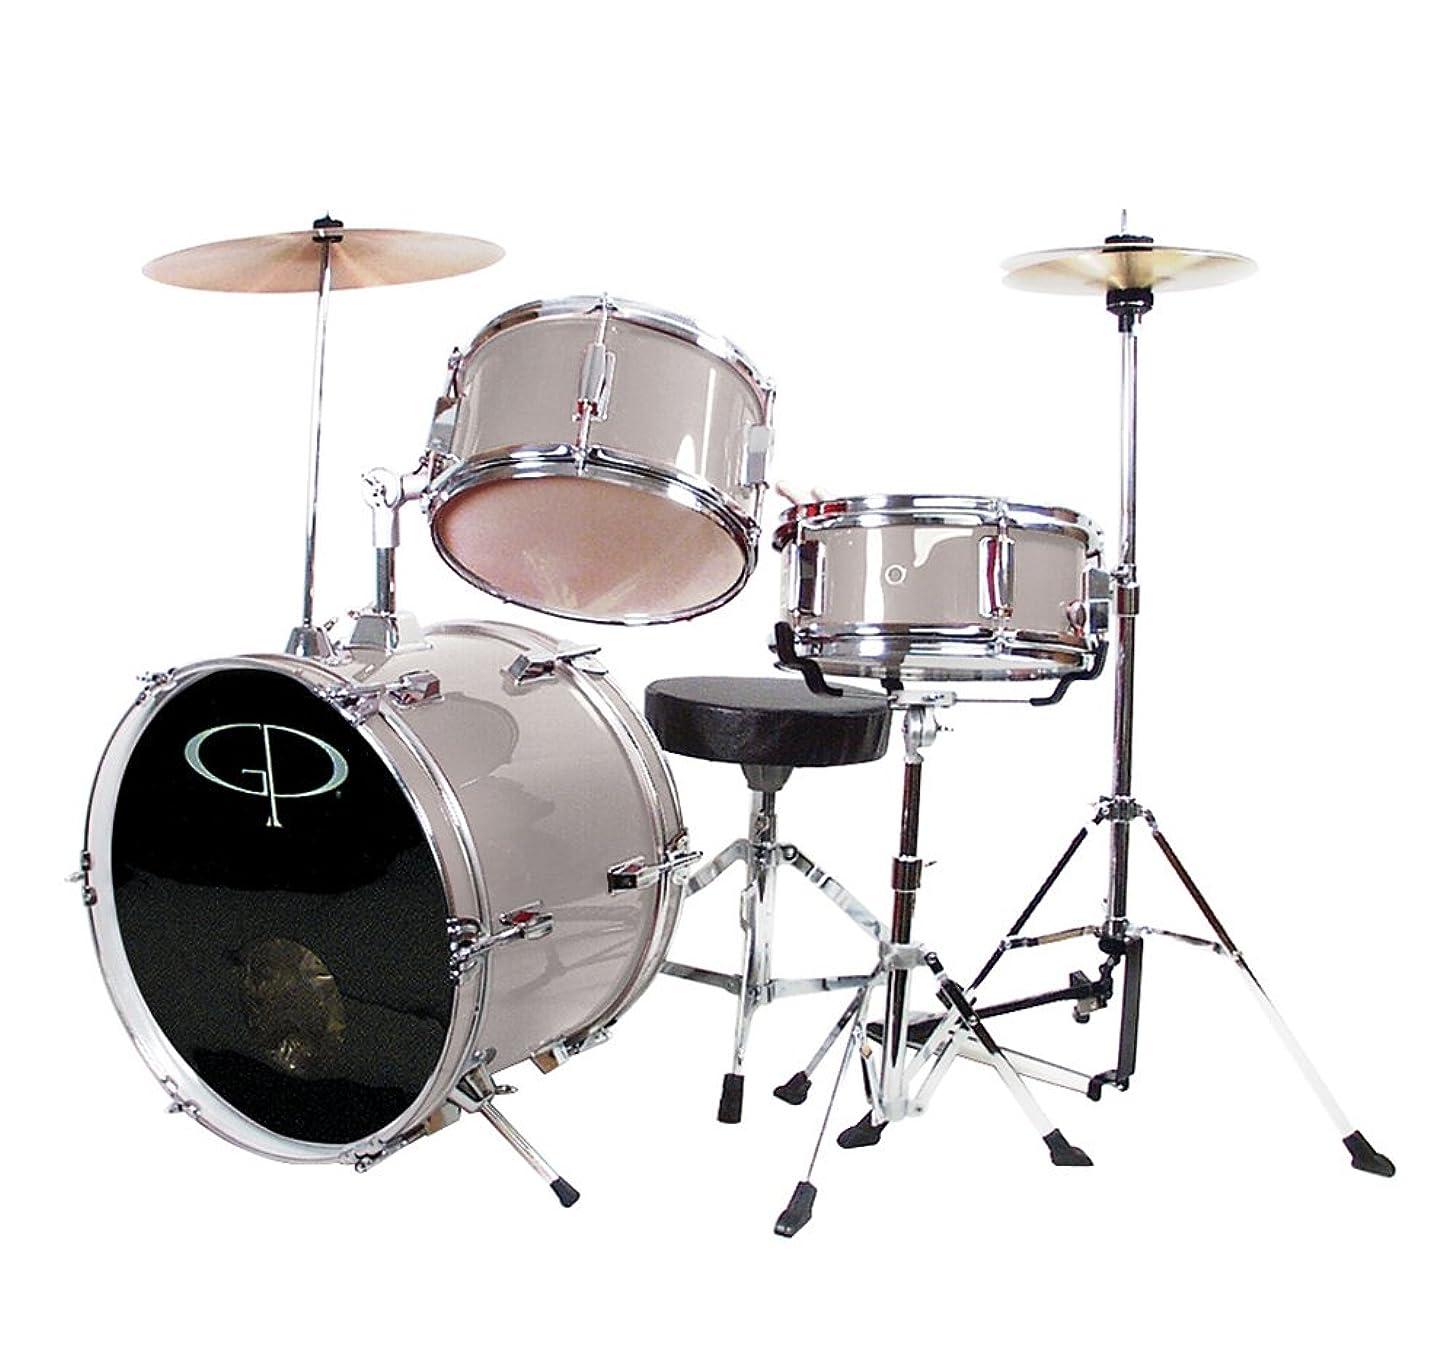 GP Percussion GP50SV Complete Junior Drum Set (Silver, 3-Piece Set)